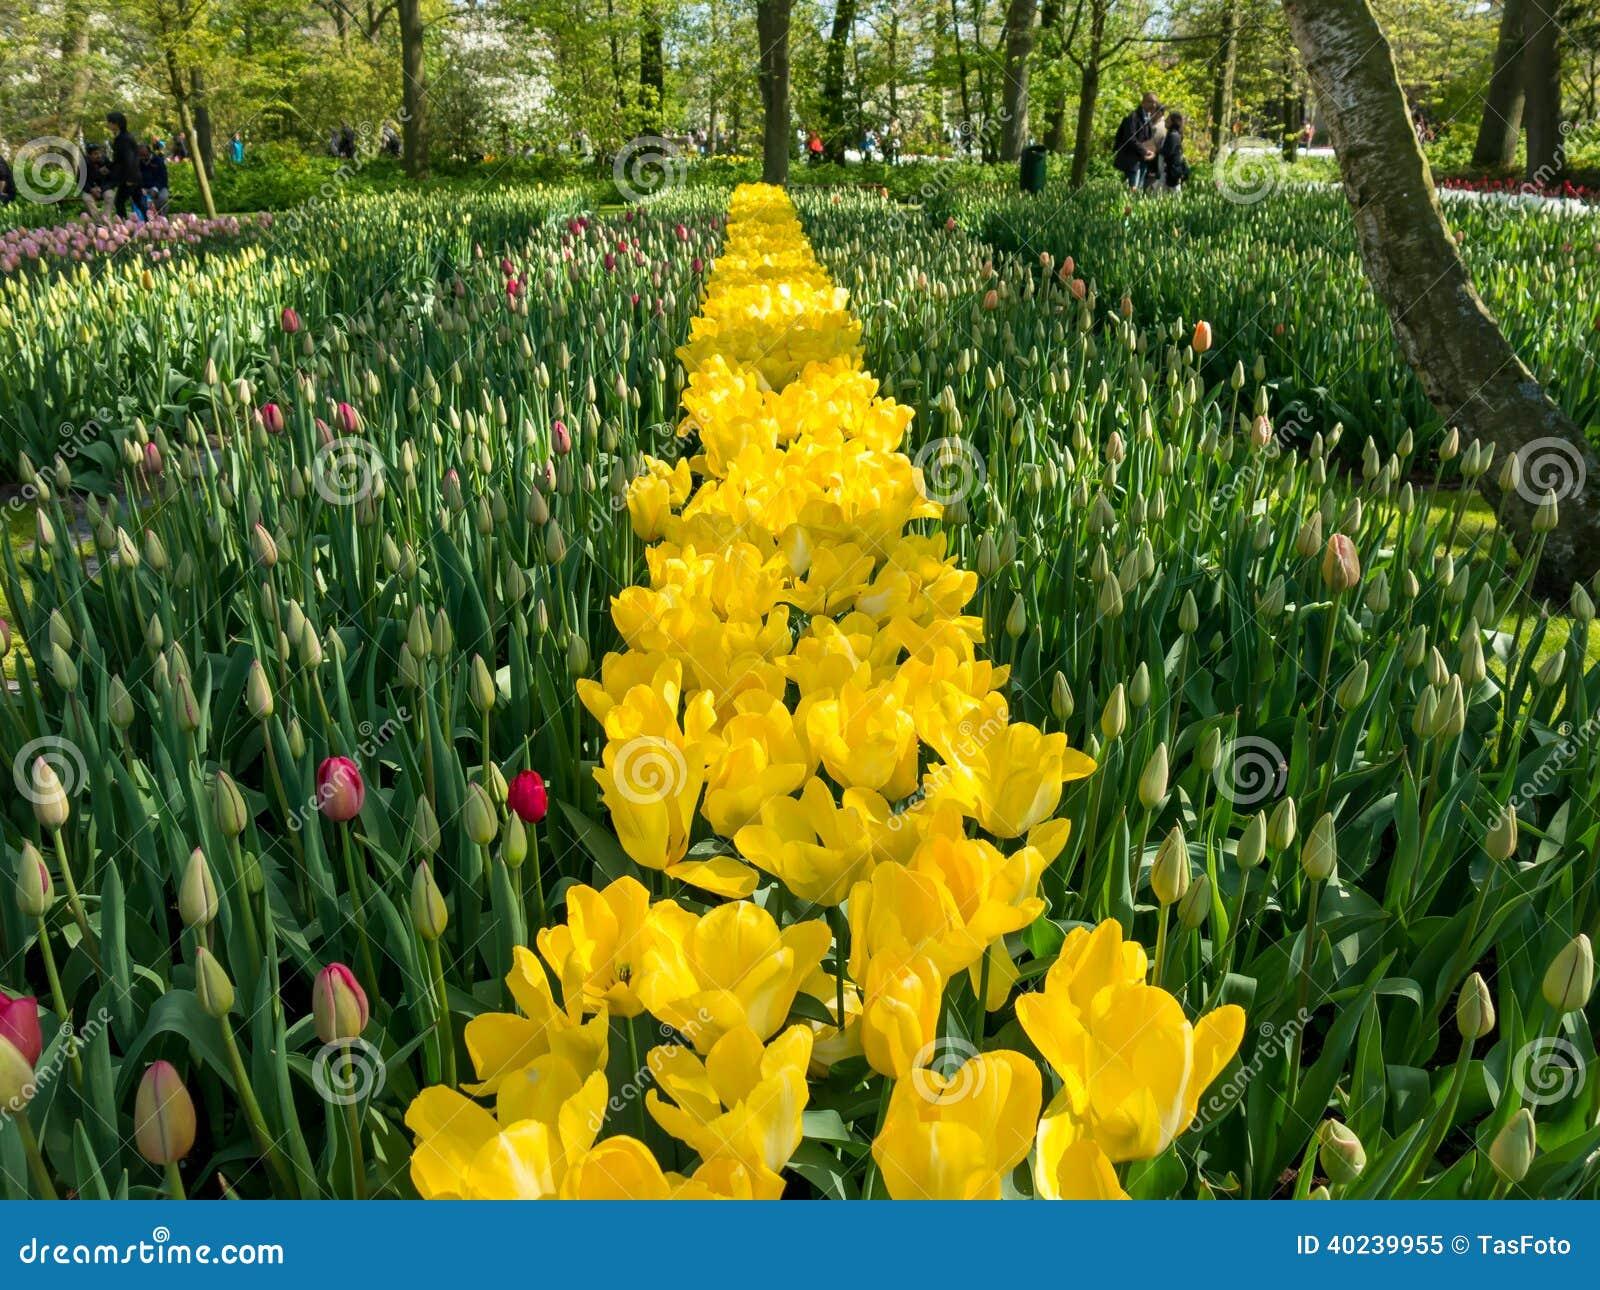 Flowering bulbs in keukenhof gardens holland editorial for Bulb garden designs